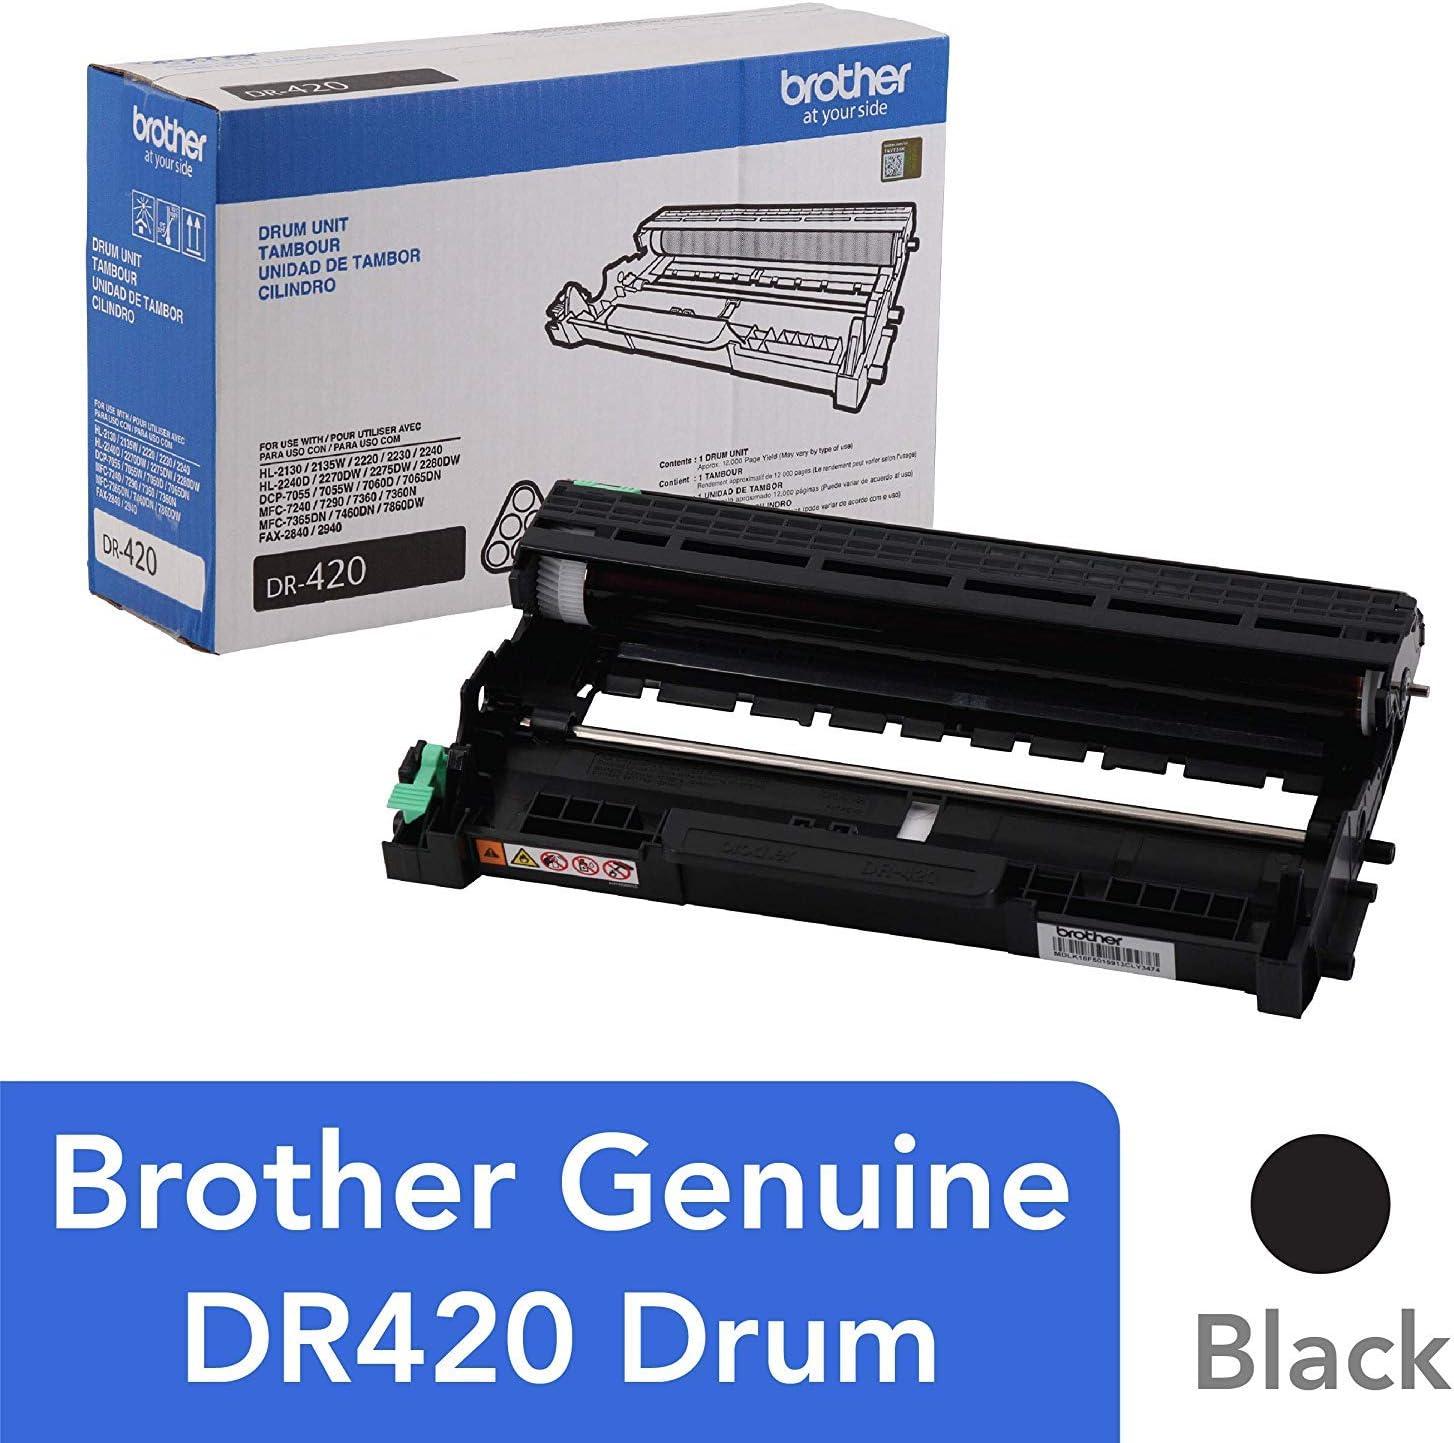 Starink DR-420 Compatible Drum Unit Brother DR420 Black 1 Pack, Drum Unit, 12000 Pages ,Replacement for HL-2270DW HL-2280DW MFC-7860DW DCP-7065DN MFC-7360N HL-2230 HL-2240 MFC-7460DN